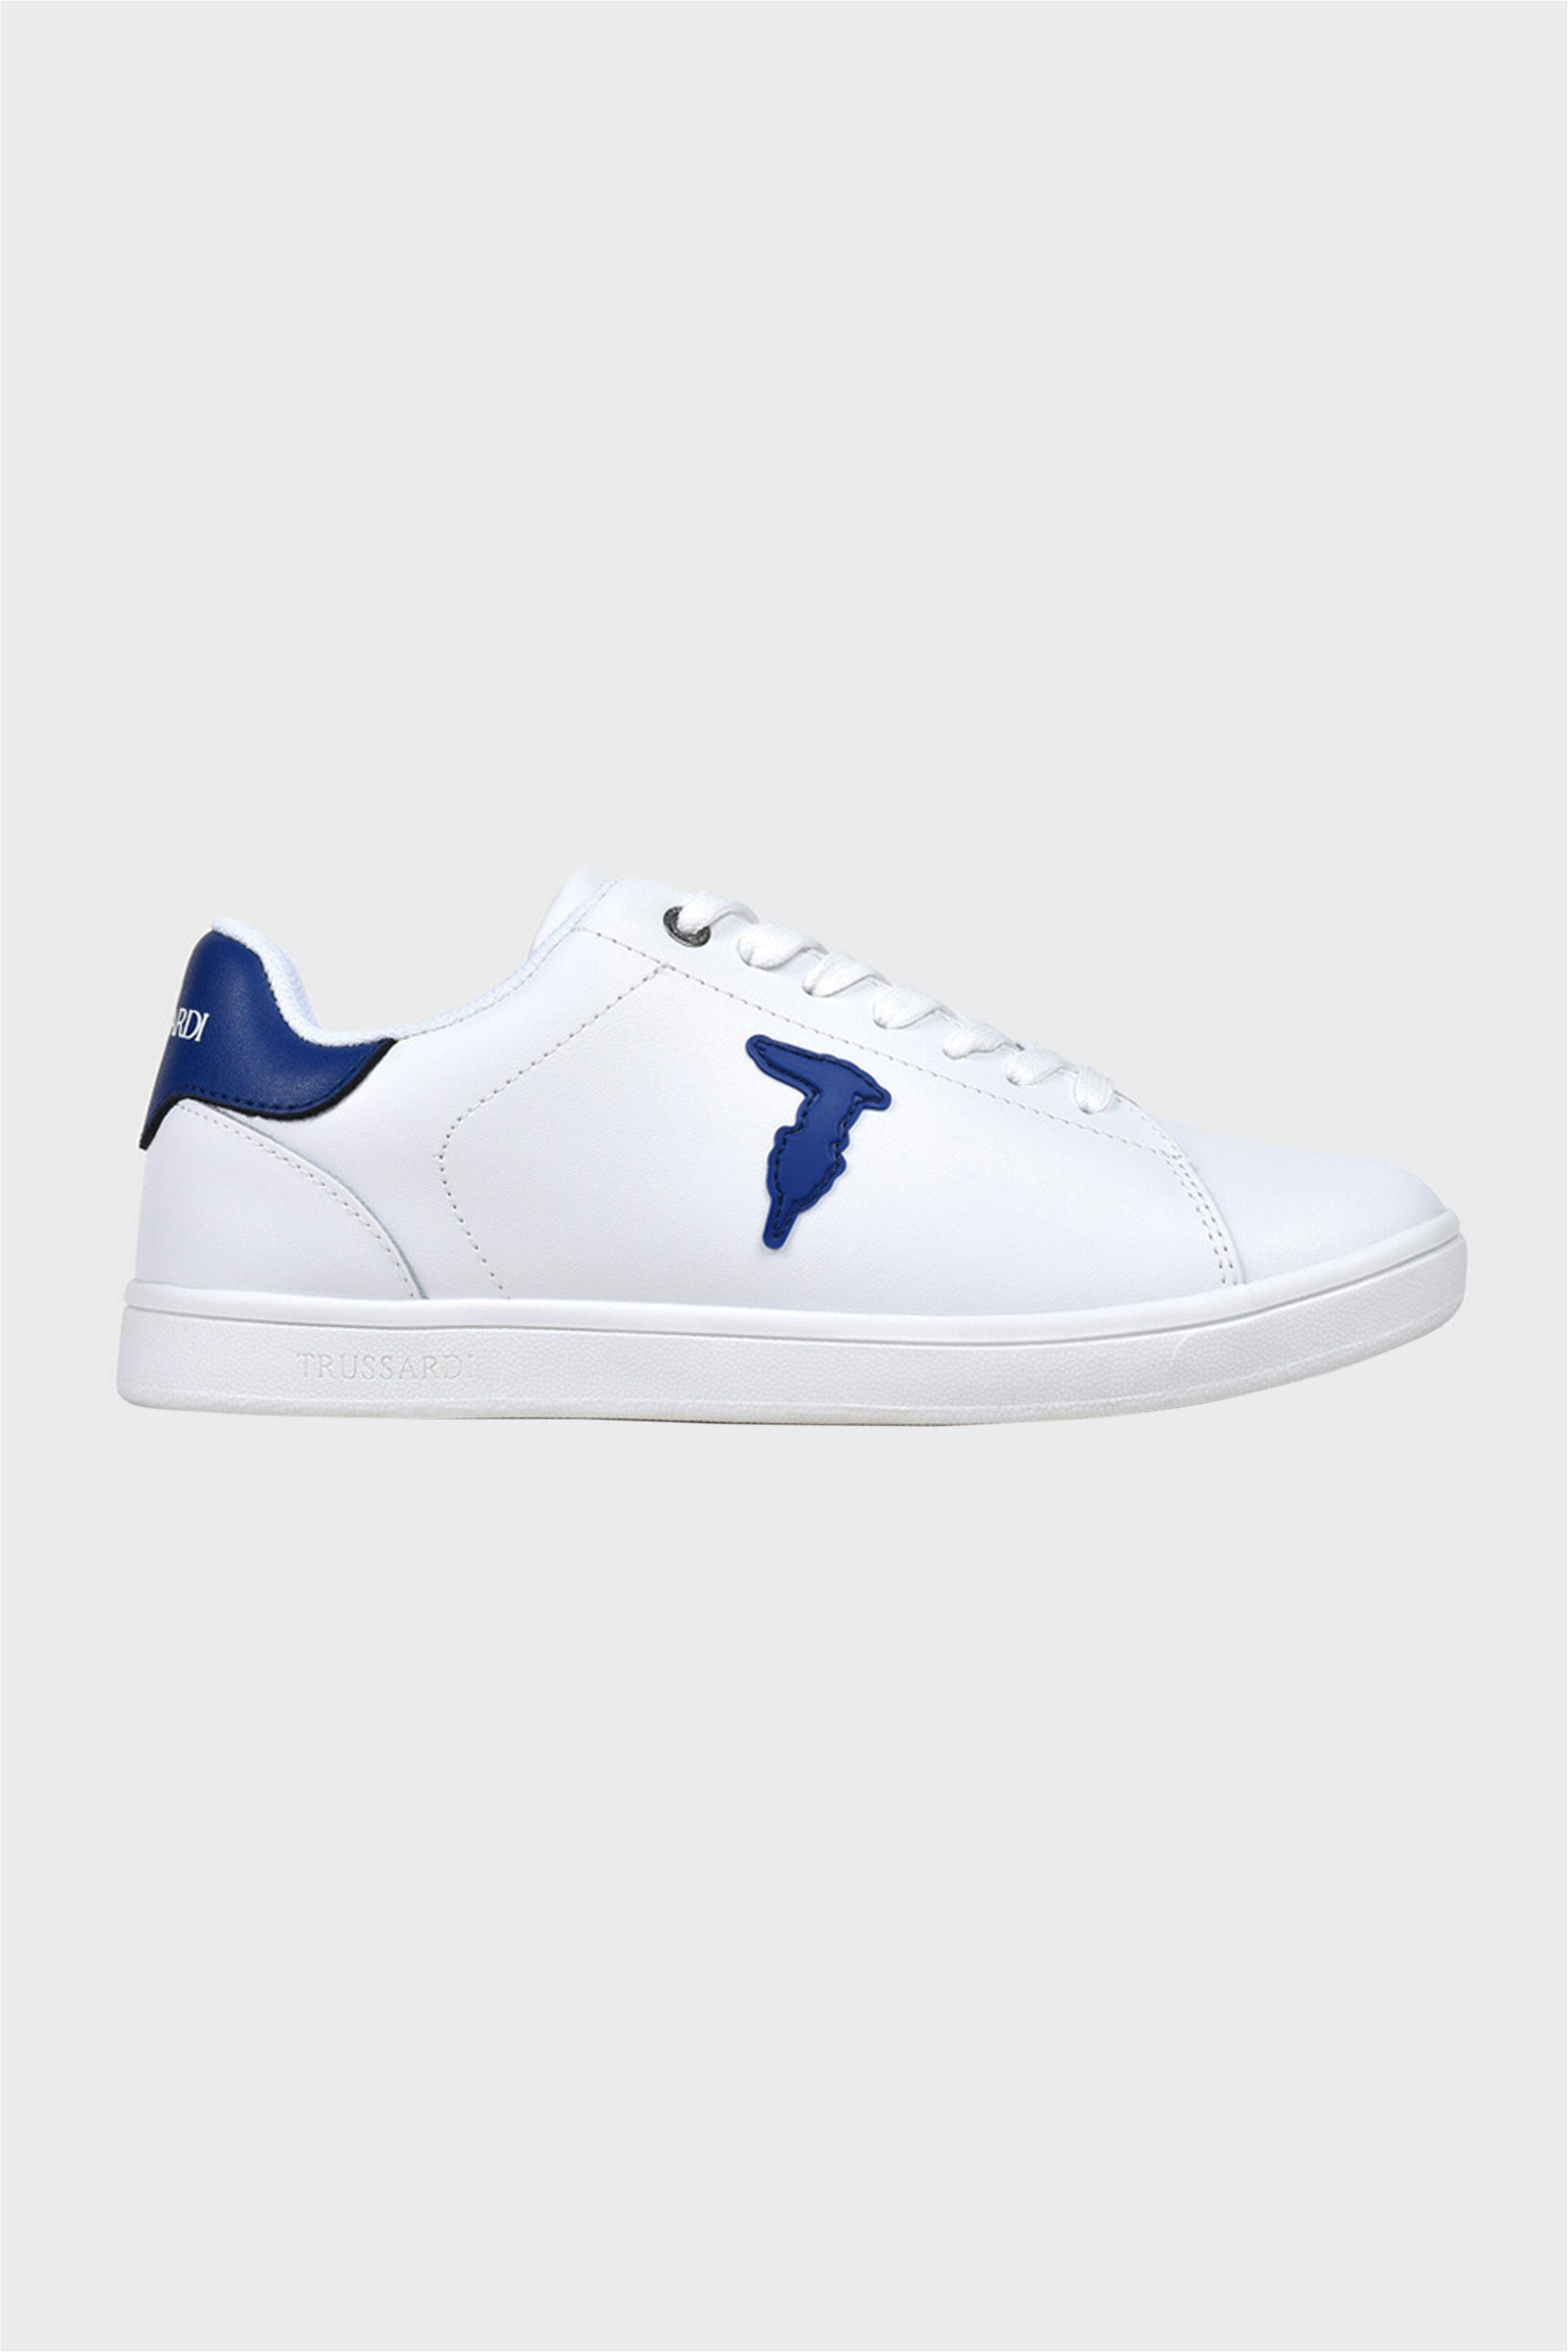 Trussardi ανδρικά sneakers με κορδόνια και logo patch – 77A00241-9Y099999 – Μπλε Σκούρο